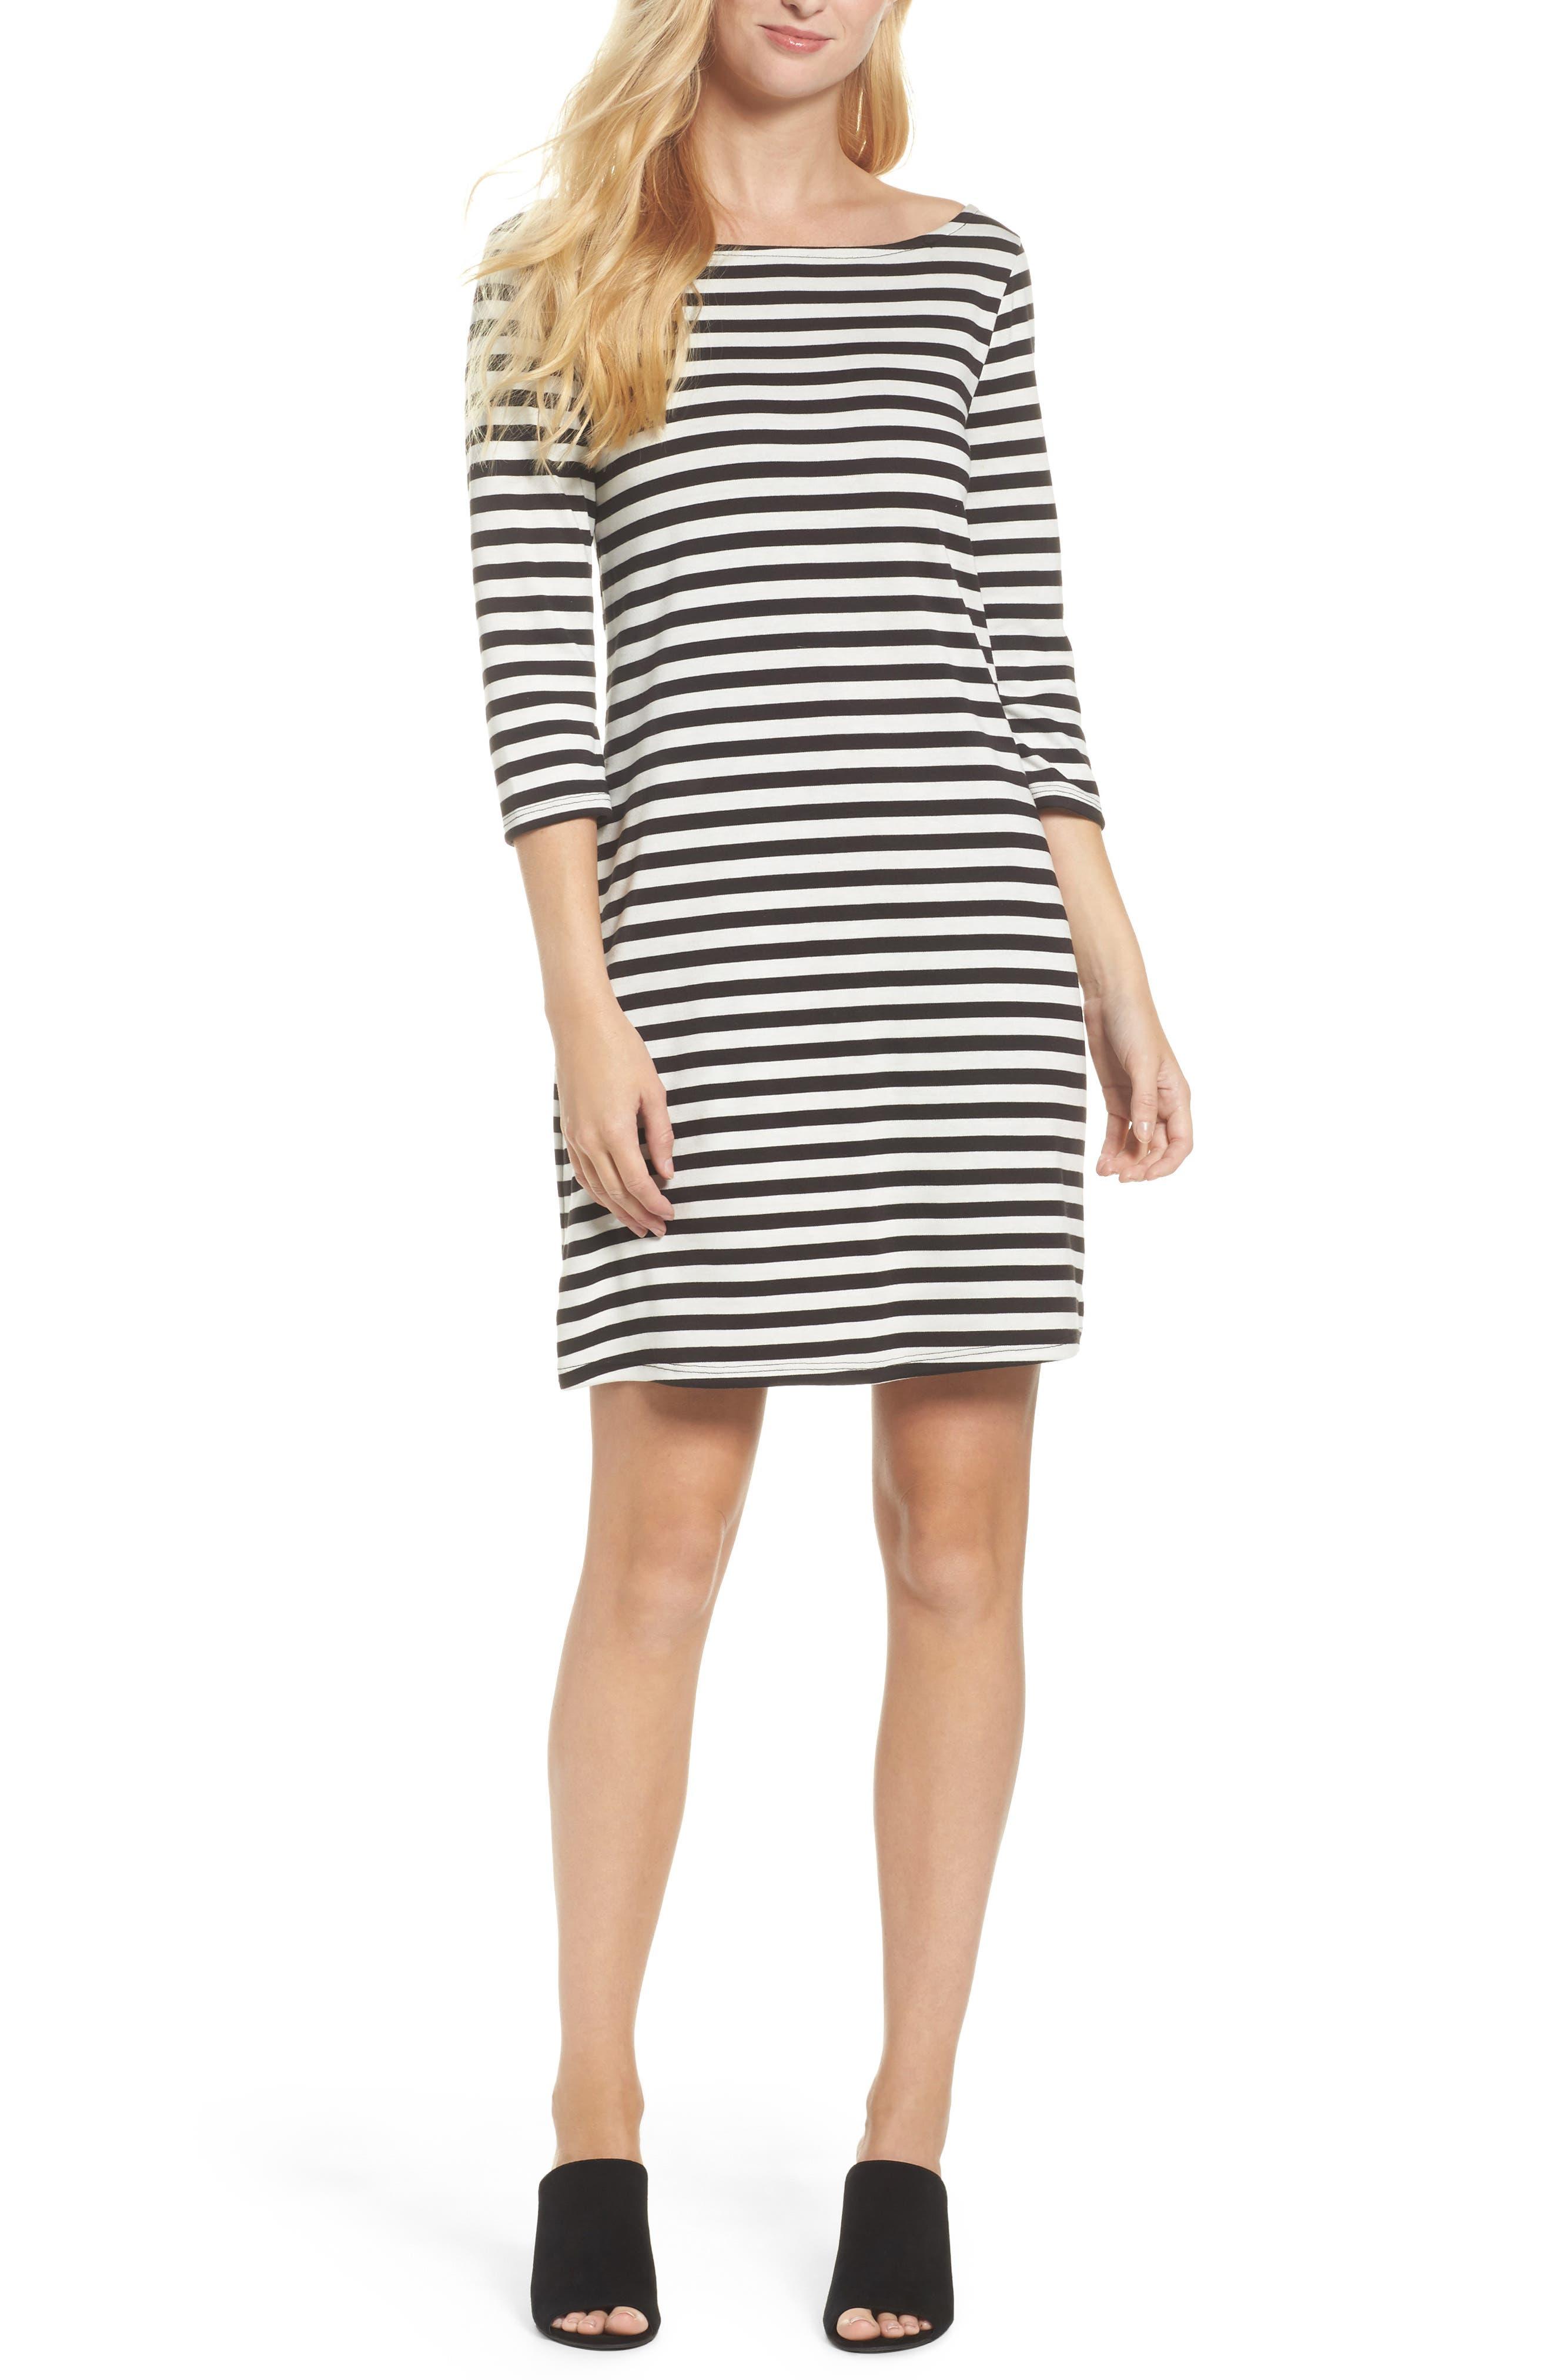 Leota Nouveau Stripe Shift Dress